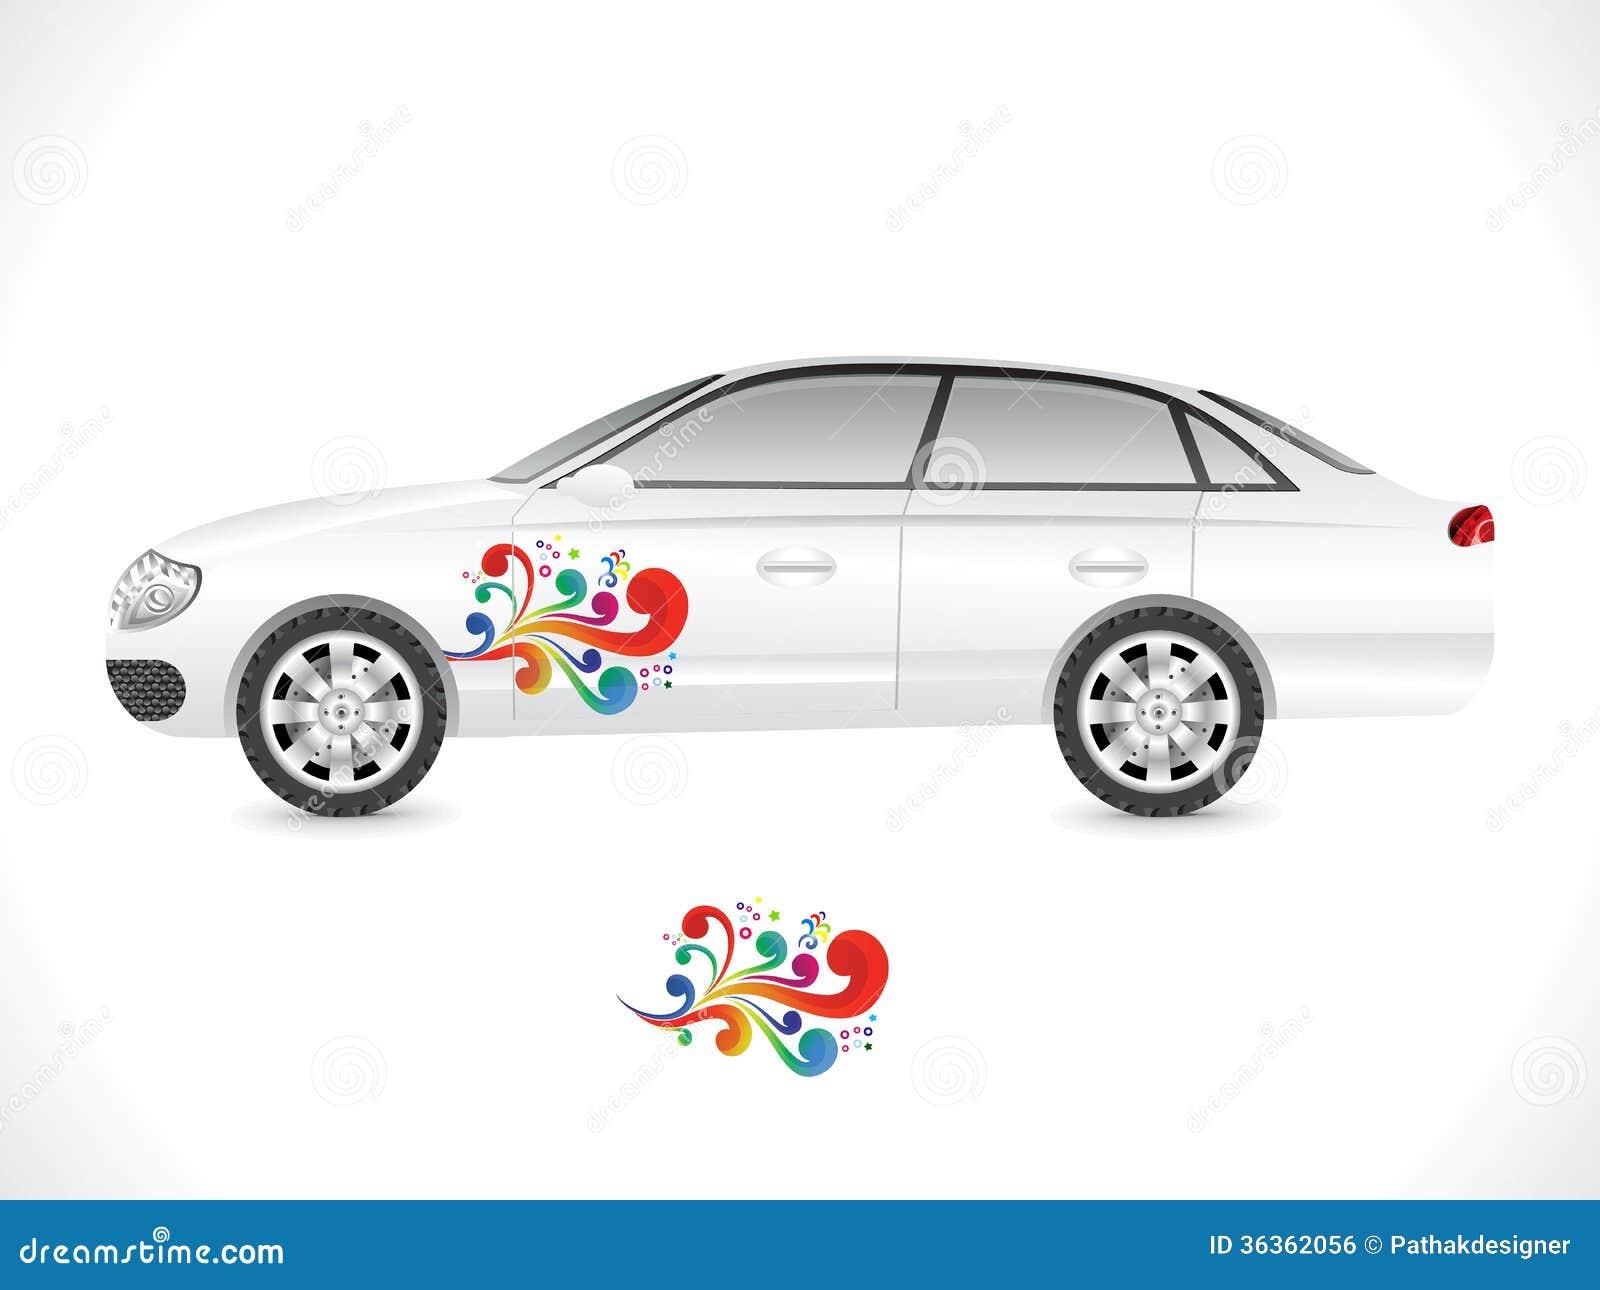 Car sticker design download - Car Illustration Sedan Sticker